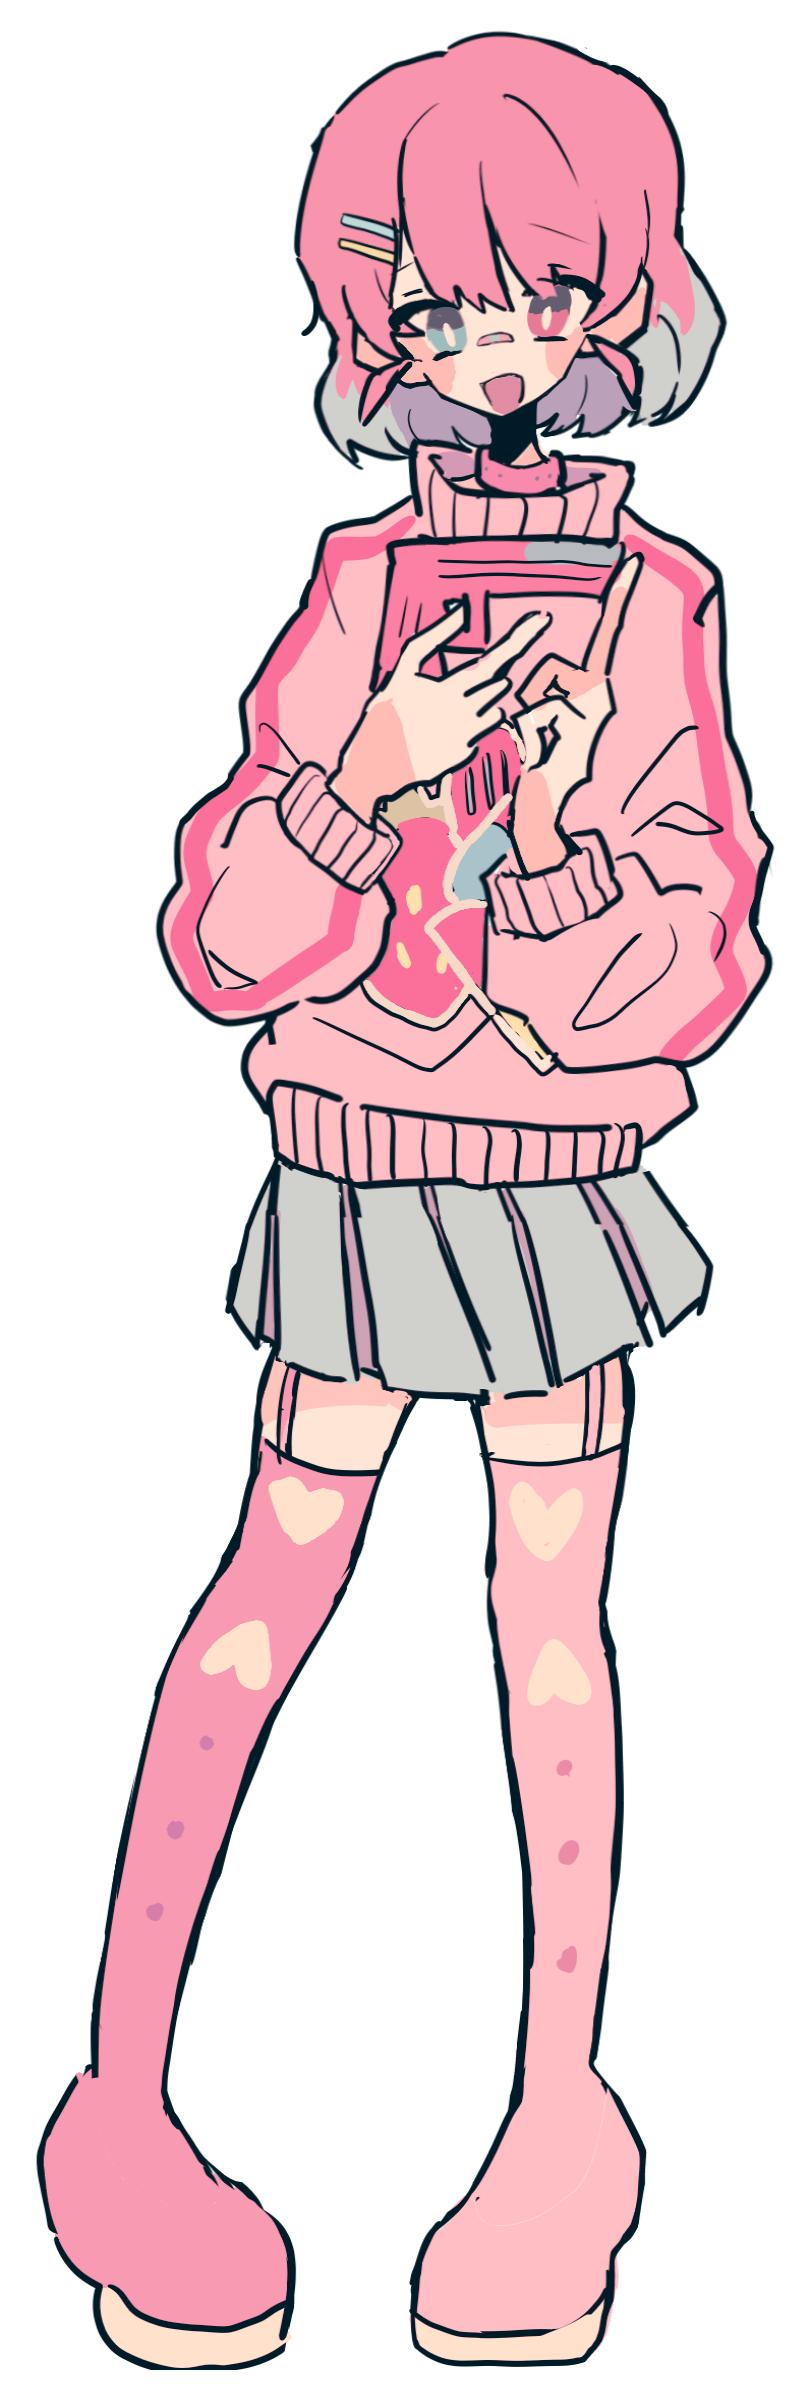 OC Illust of mutak medibangpaint girl oc pink